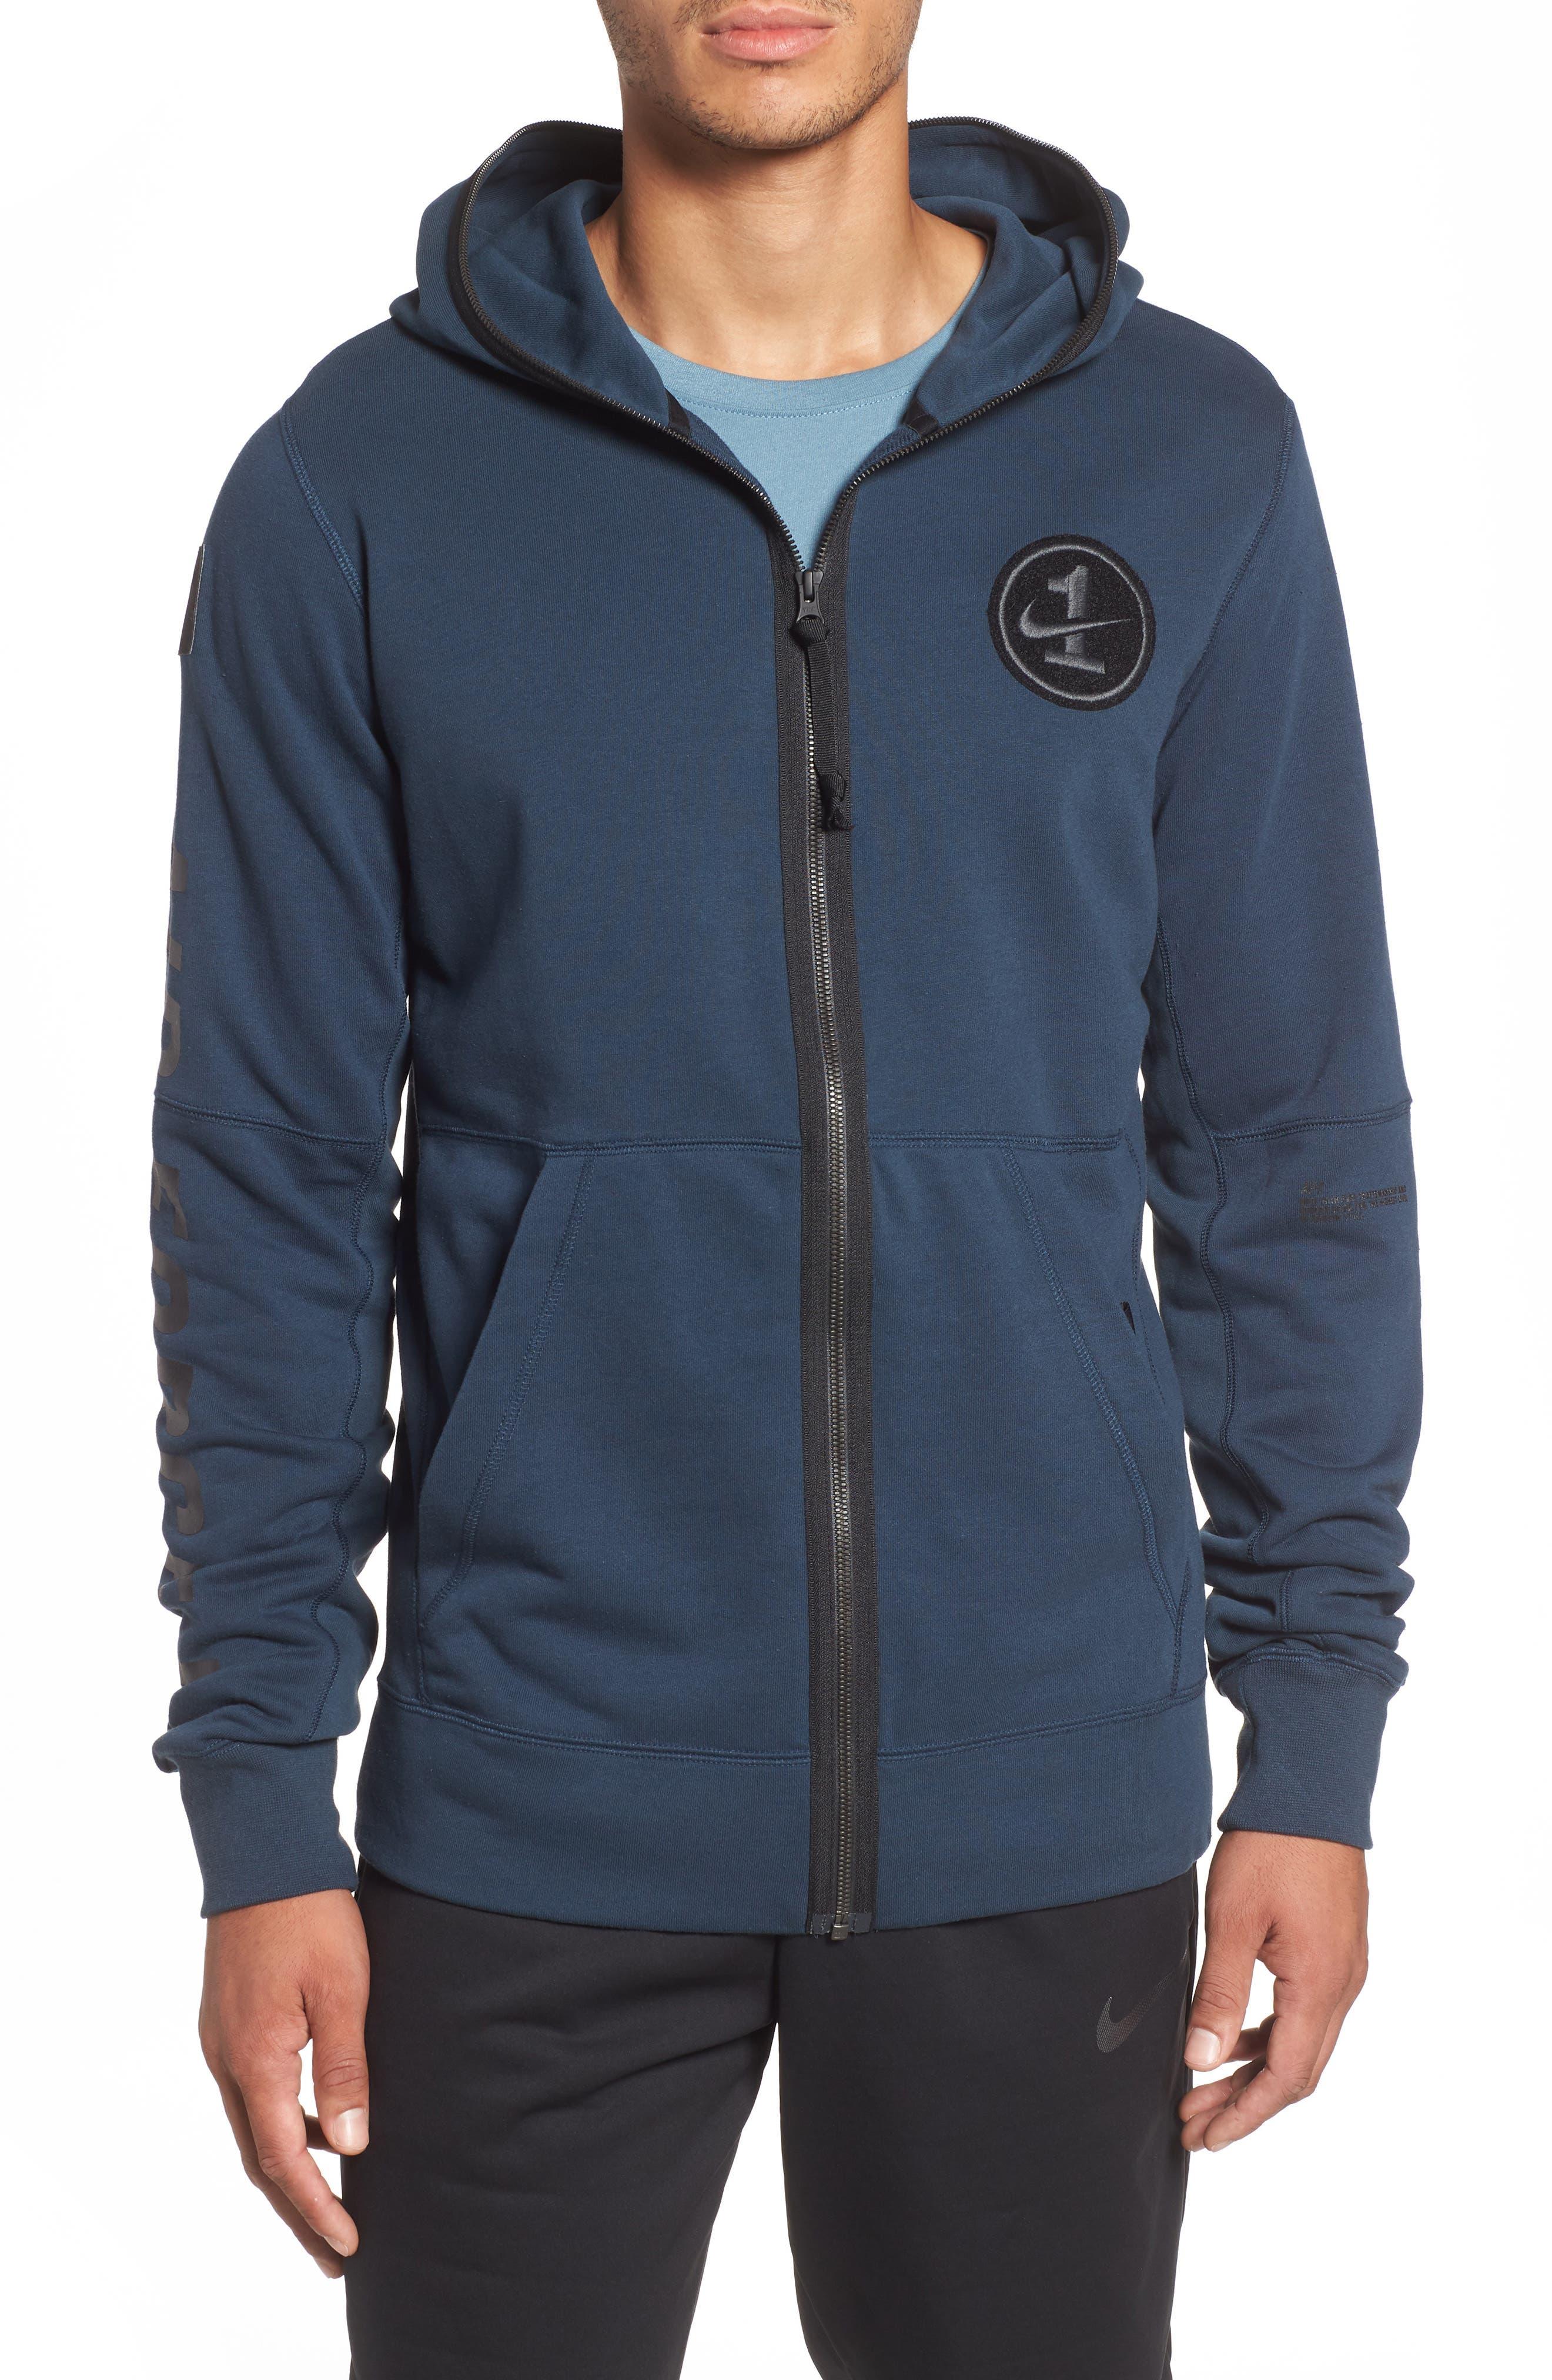 NIKE, Air Force One Zip Hoodie Jacket, Main thumbnail 1, color, ARMORY NAVY/ BLACK